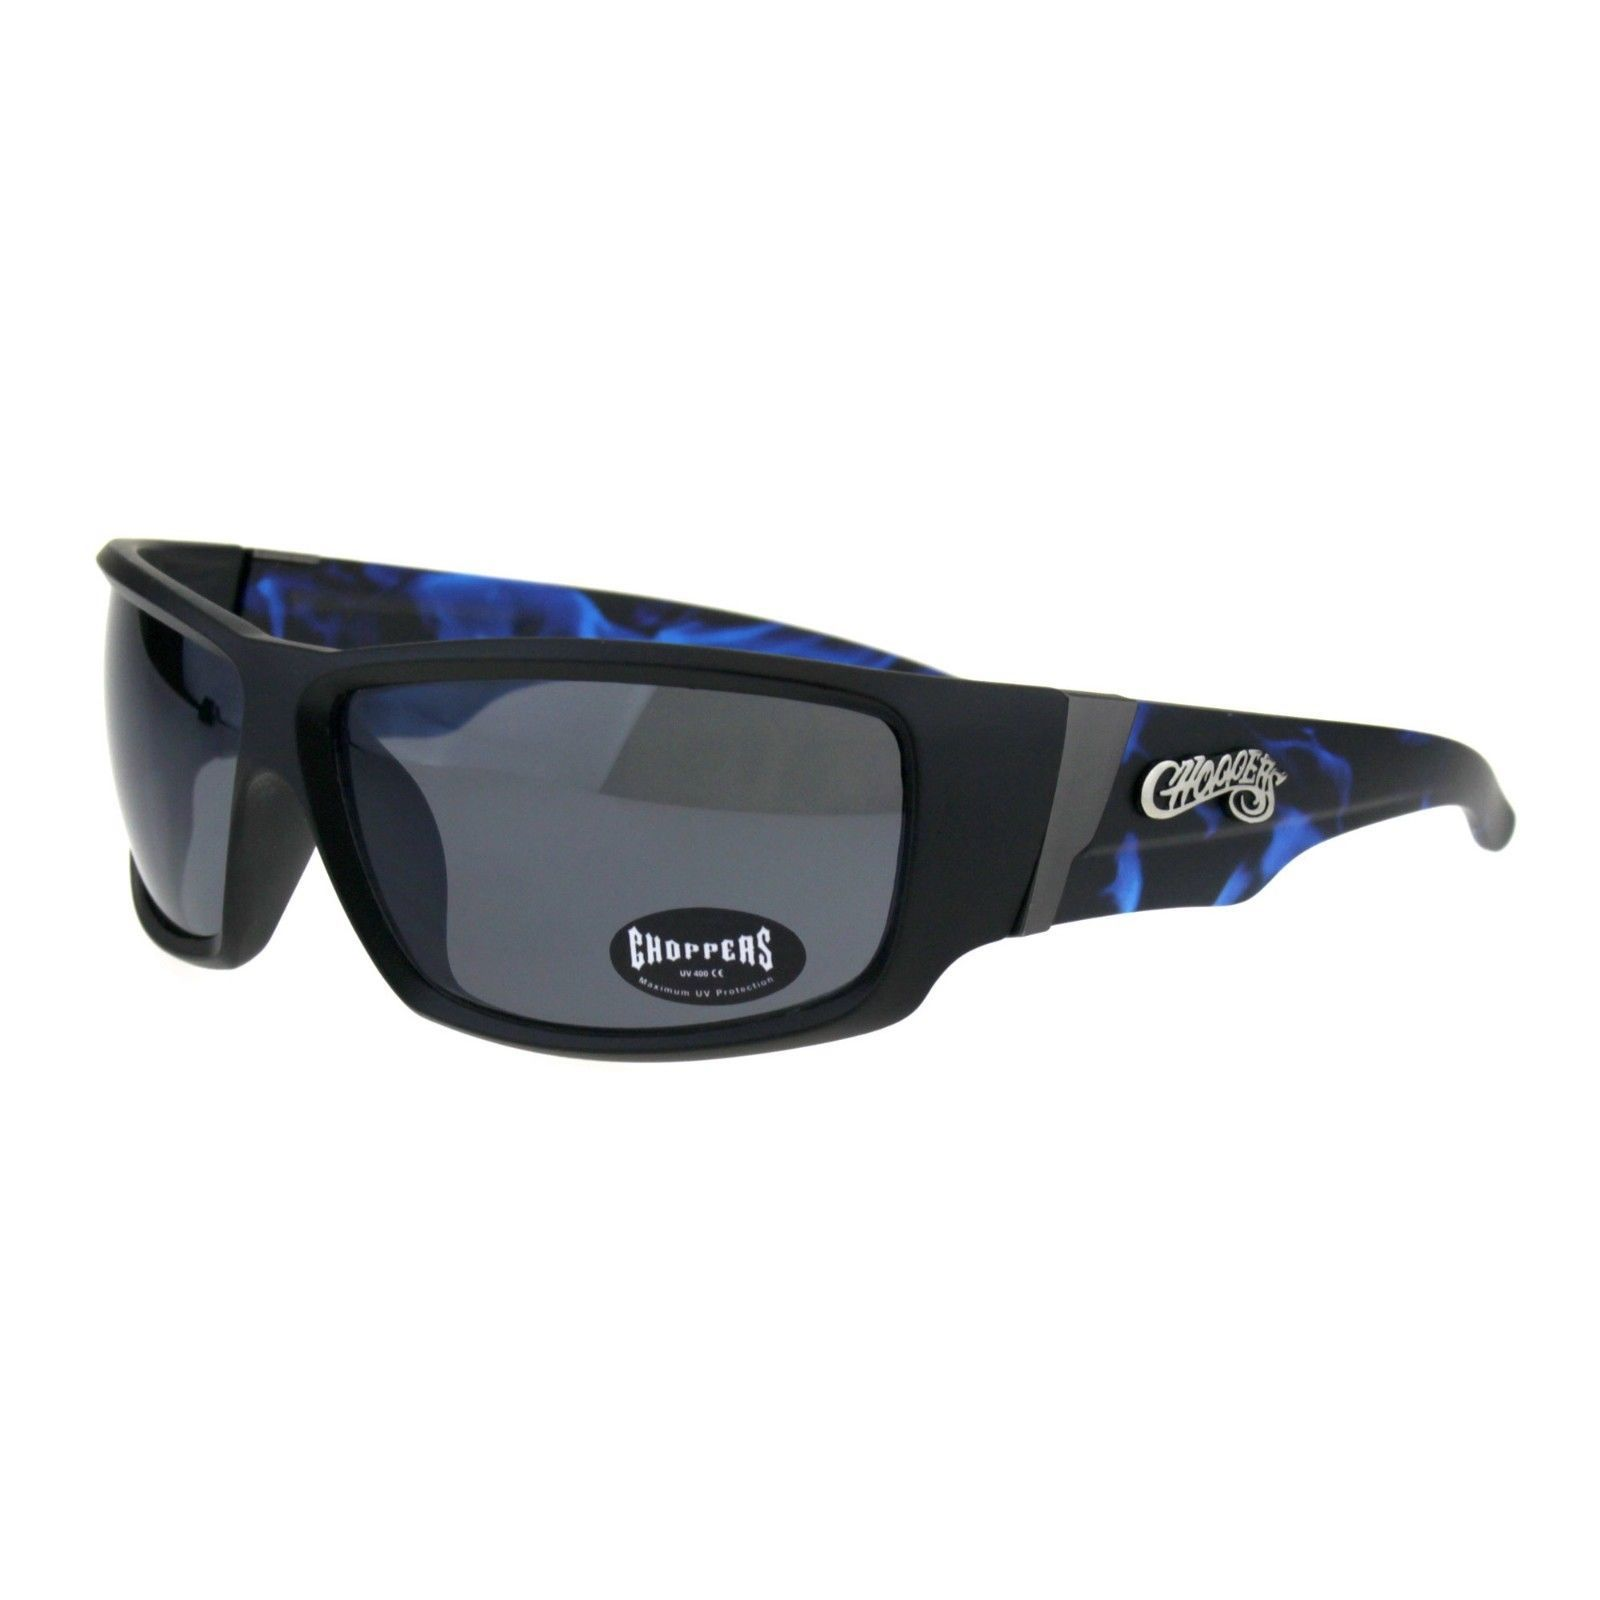 878f68f6f543 S l1600. S l1600. Previous. Choppers Sunglasses Mens Biker Fashion  Rectangular Flame Design. Choppers Sunglasses ...